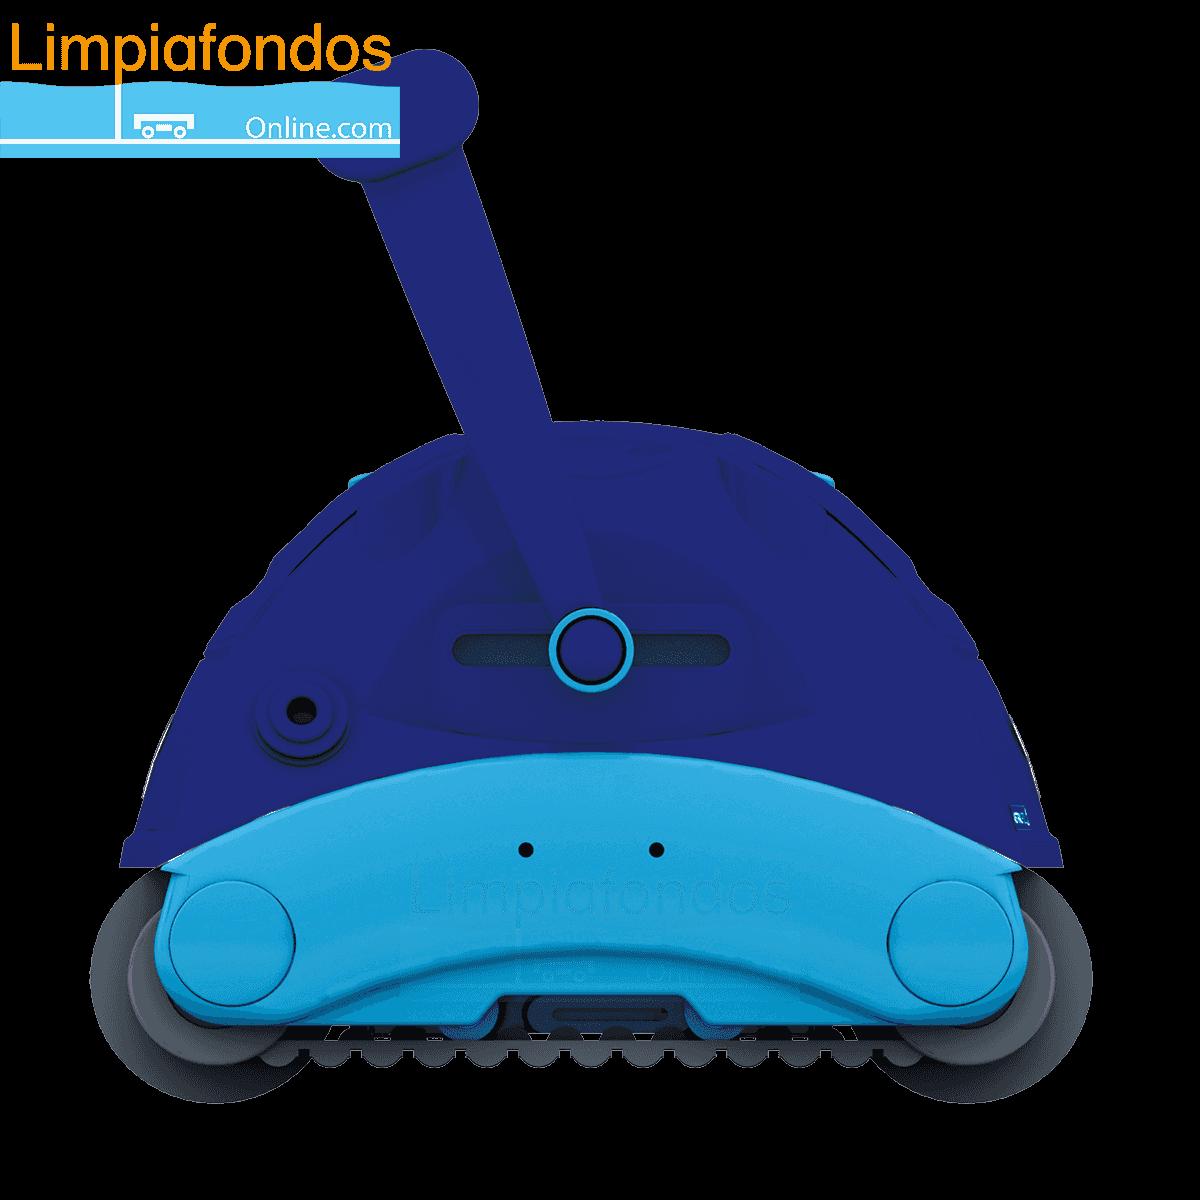 Limpiafondos astralpool pulit advance 3 plus for Limpiafondos para piscinas